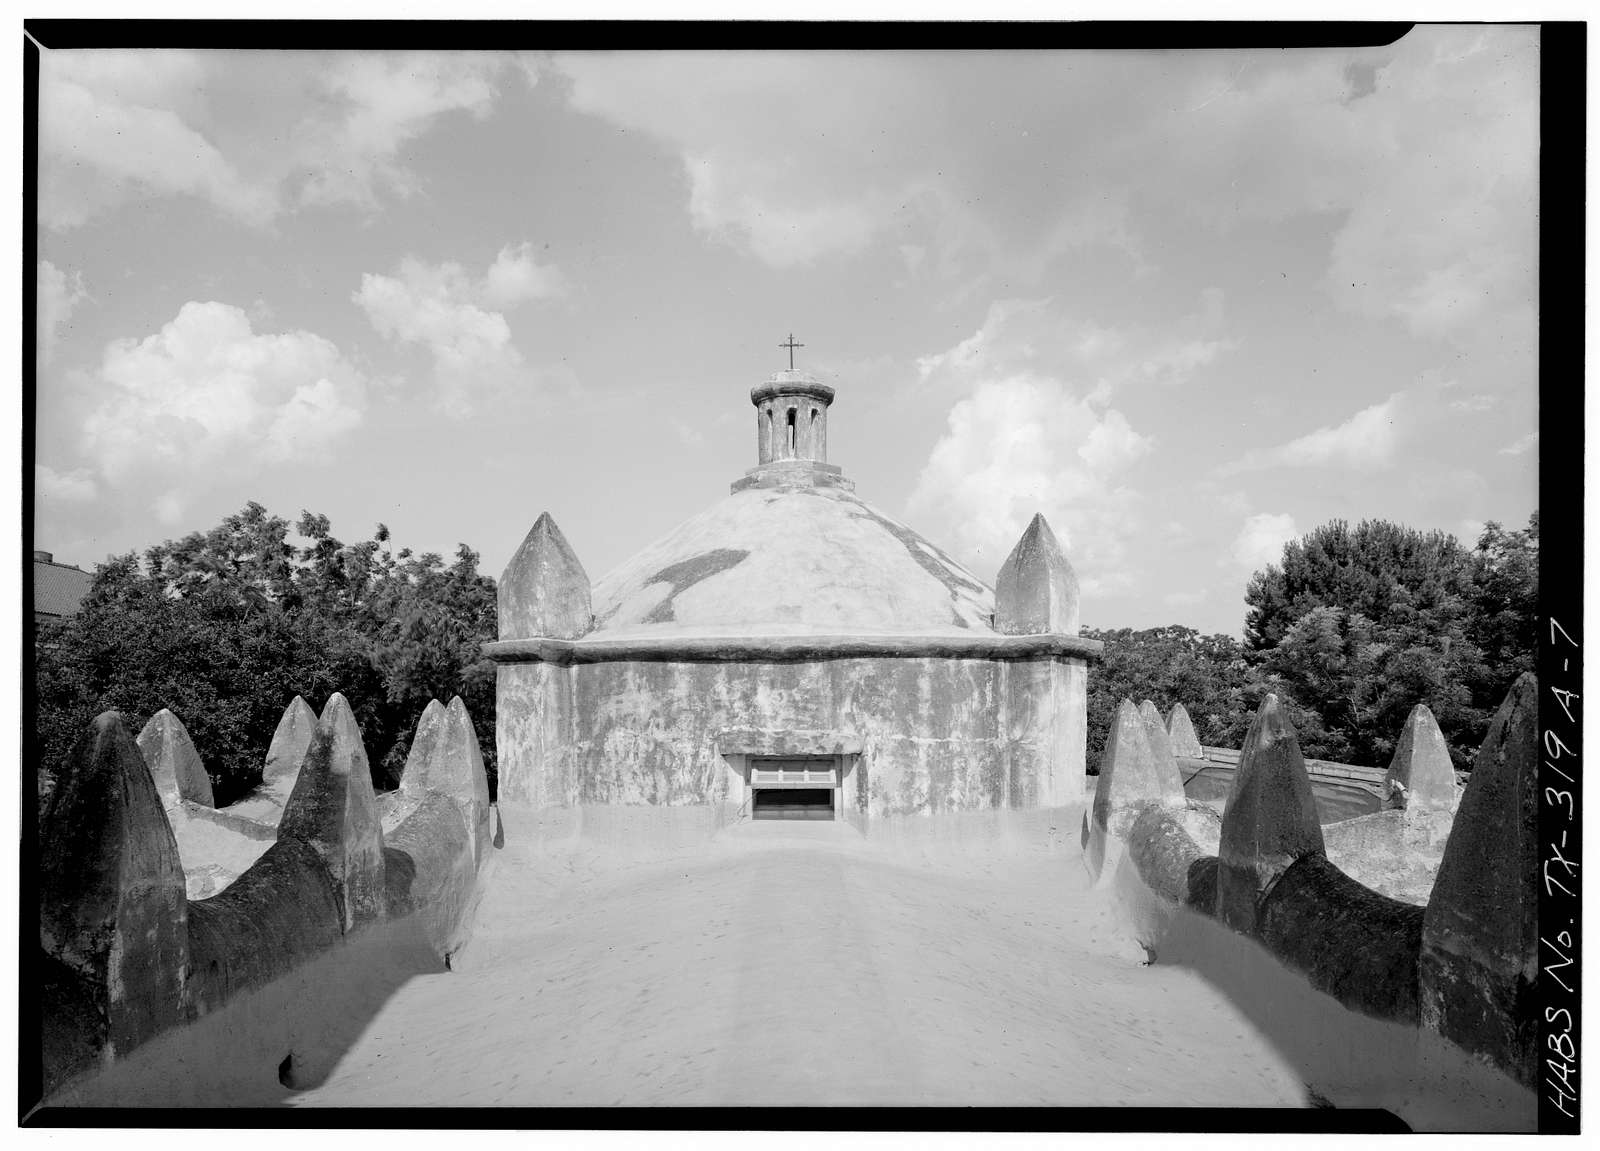 Mission Senora de la Purisima Concepcion, Church, 807 Mission Road, San Antonio, Bexar County, TX